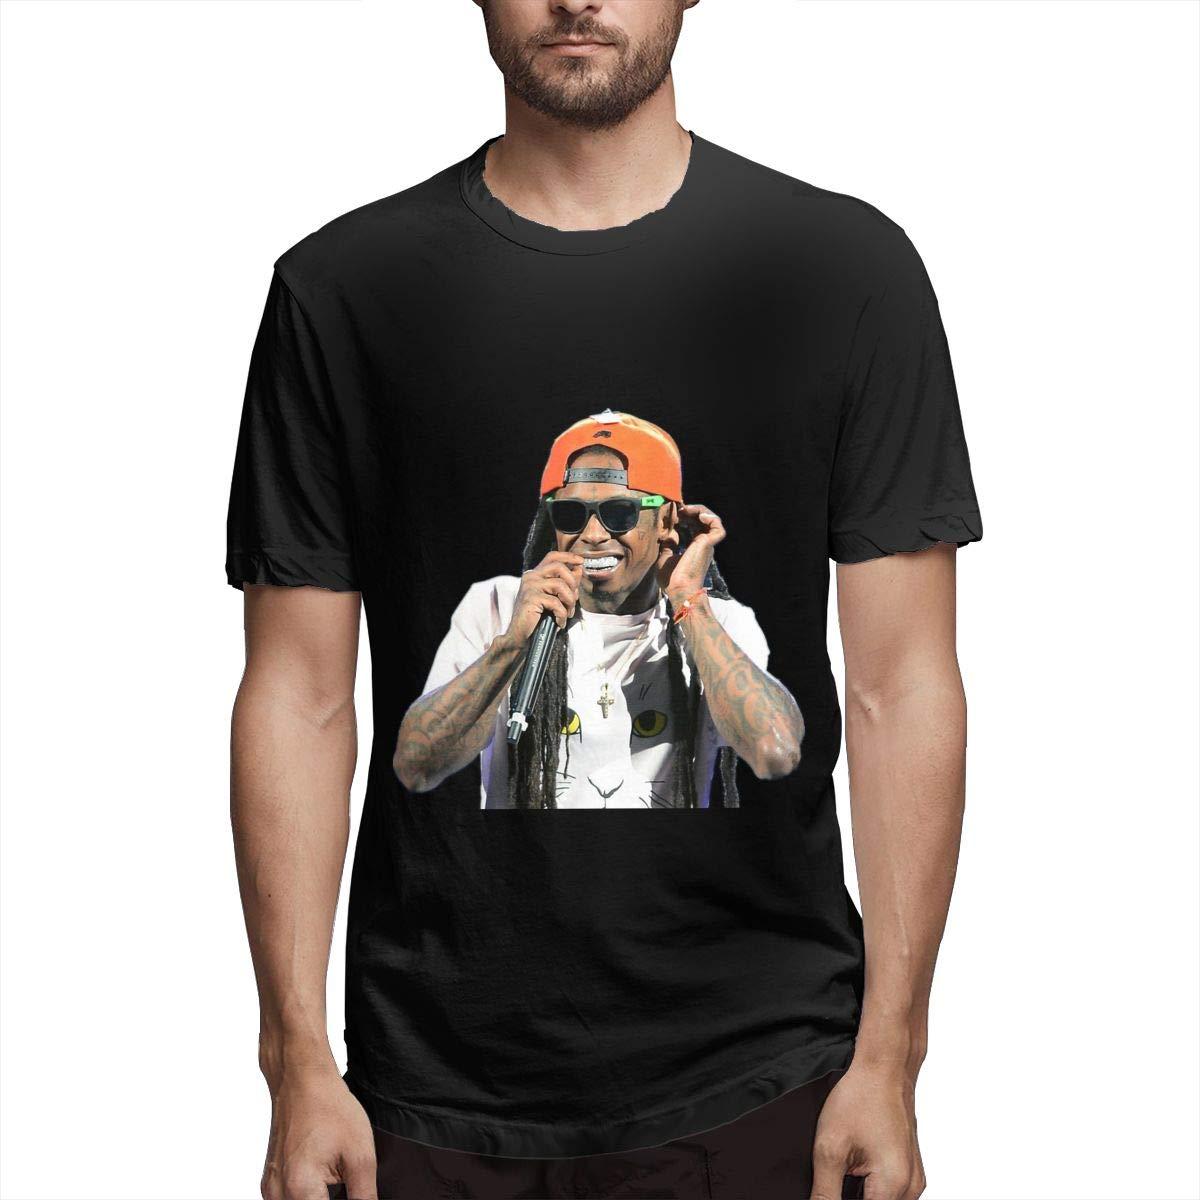 Lihehen Lil Wayne Retro Printing Round Neck Ts Shirts